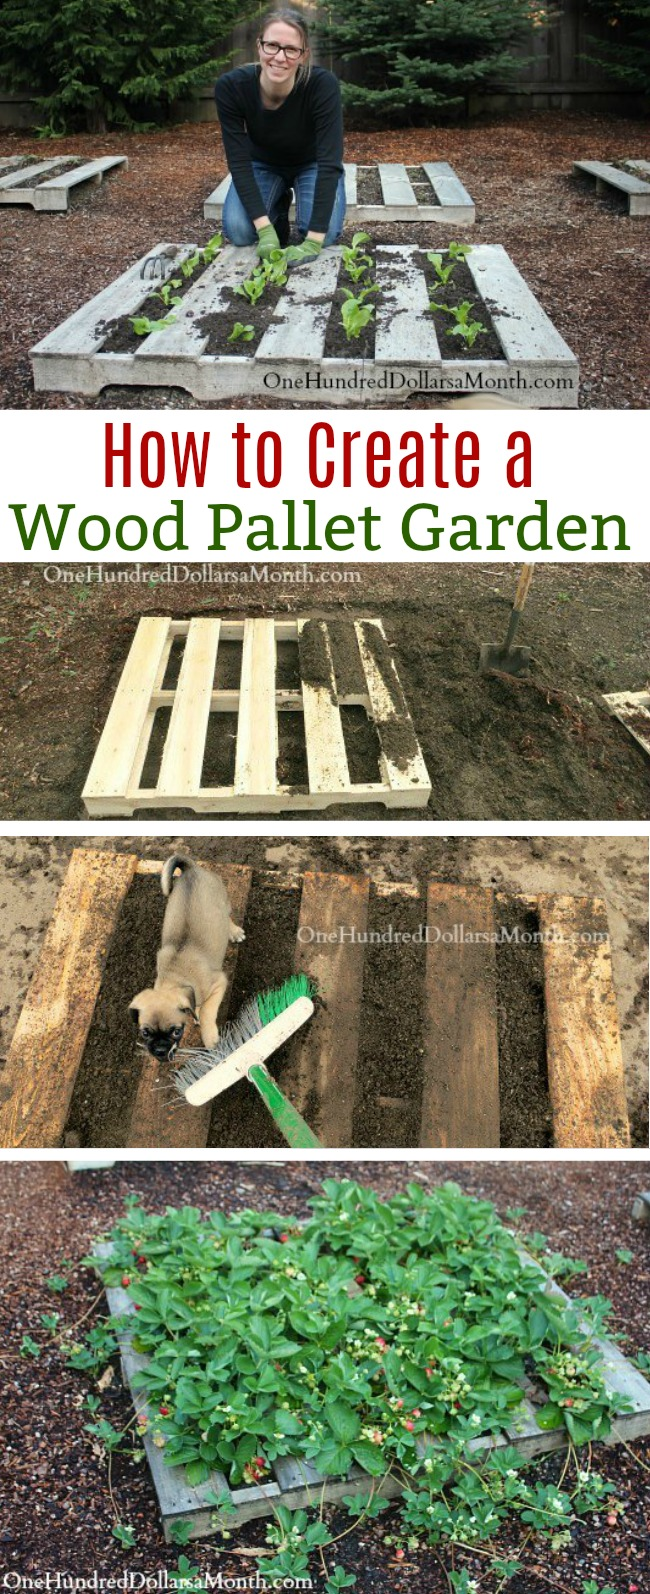 Pallet Gardening - How to Create a Wood Pallet Garden ...